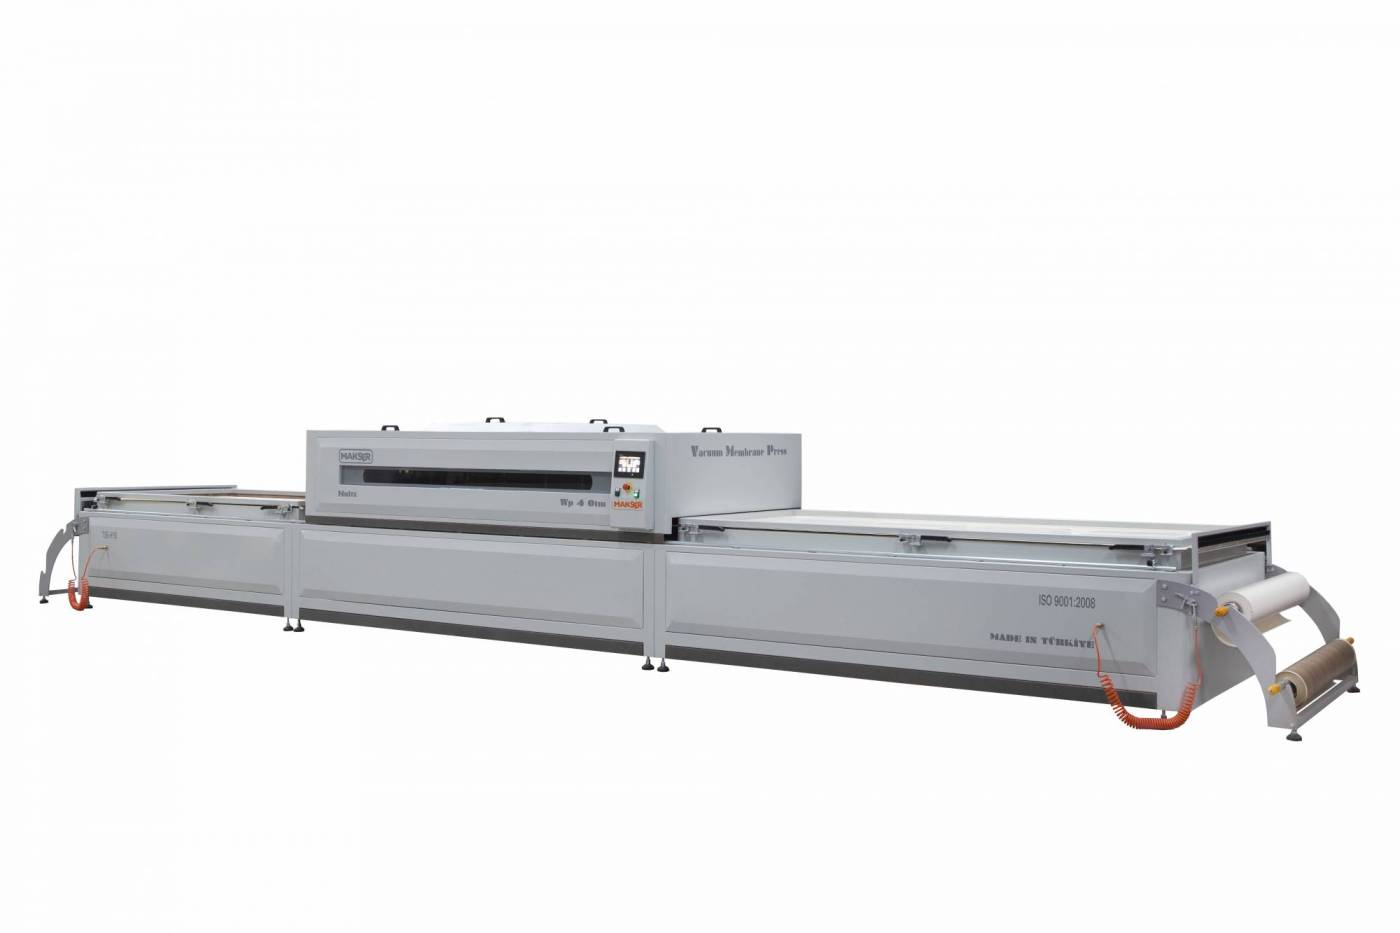 Vacuum membrane press machine WP4 OTM full automatic 3 table laminating machine